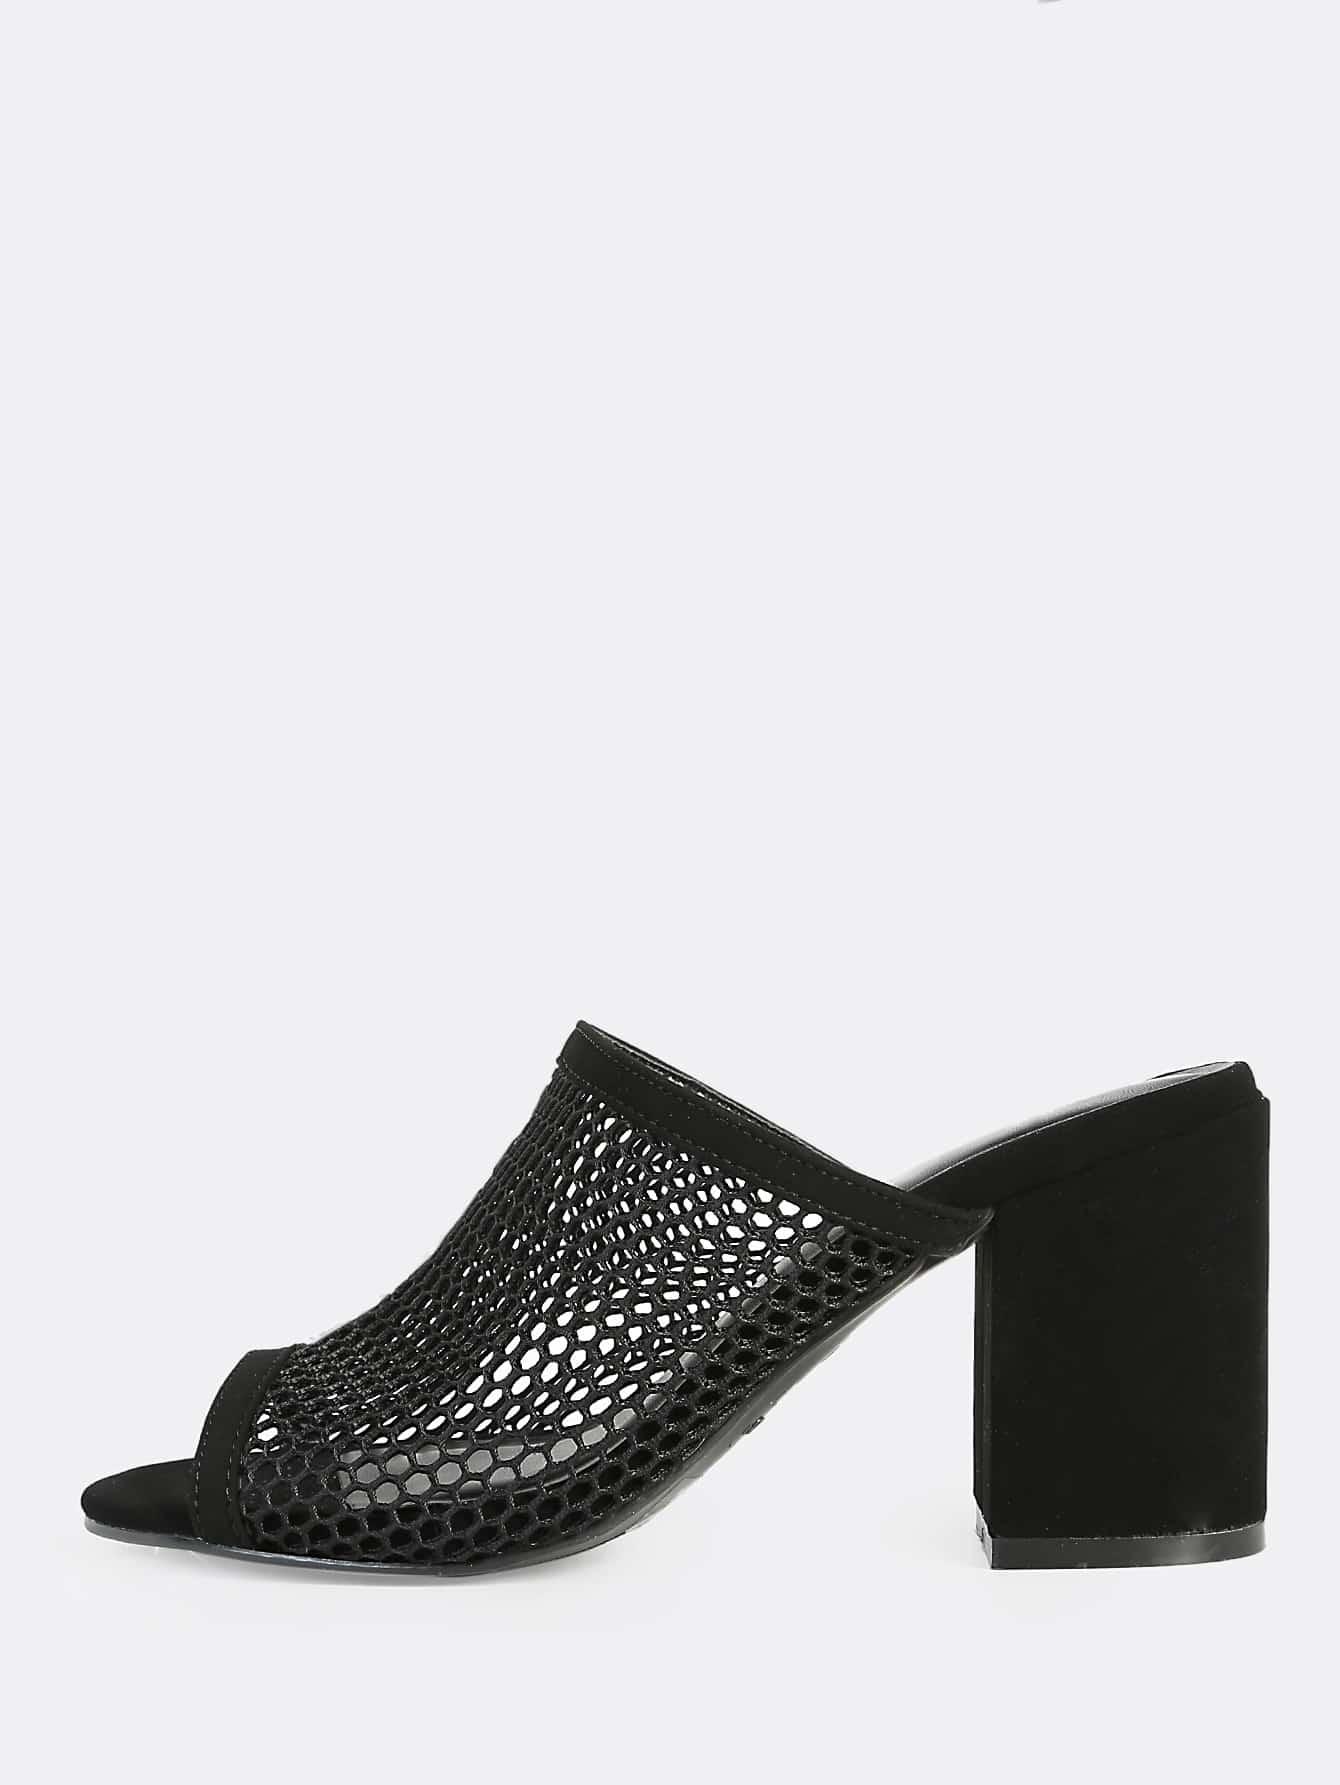 online sale Trademark Felt Peep-Toe Mules best sale prices sale online qJUdx